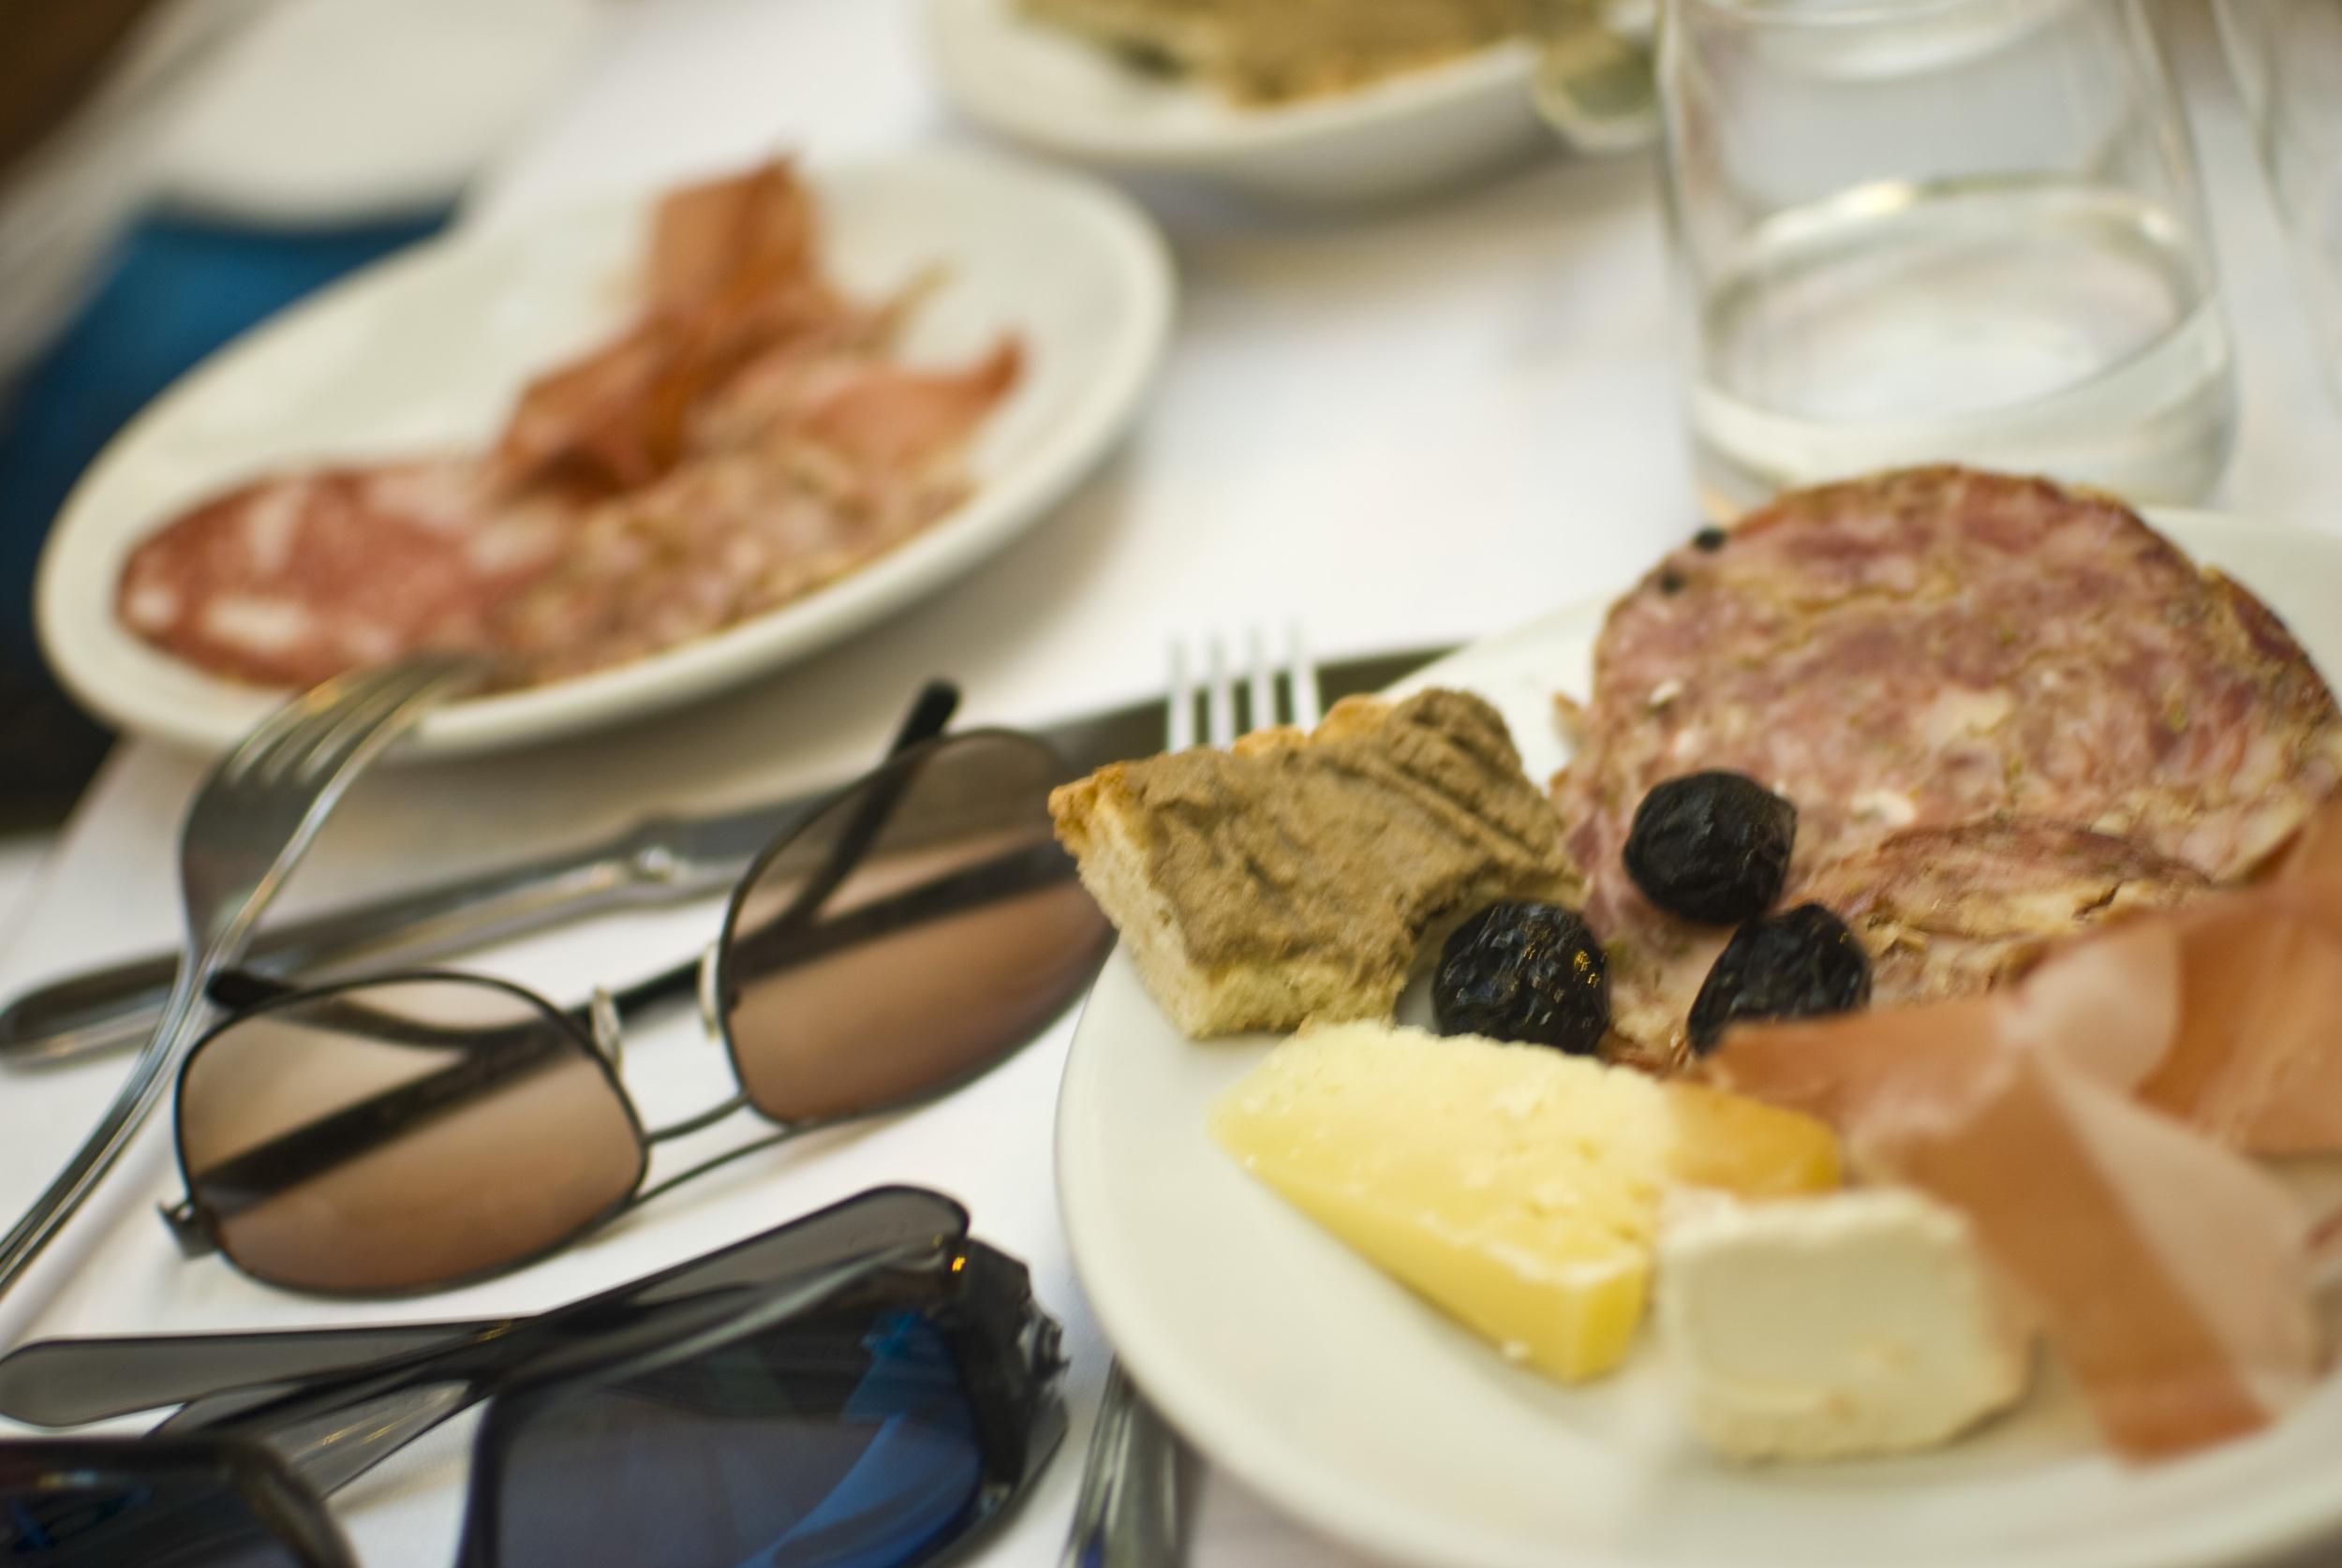 tuscany-dinner_4797266701_o.jpg